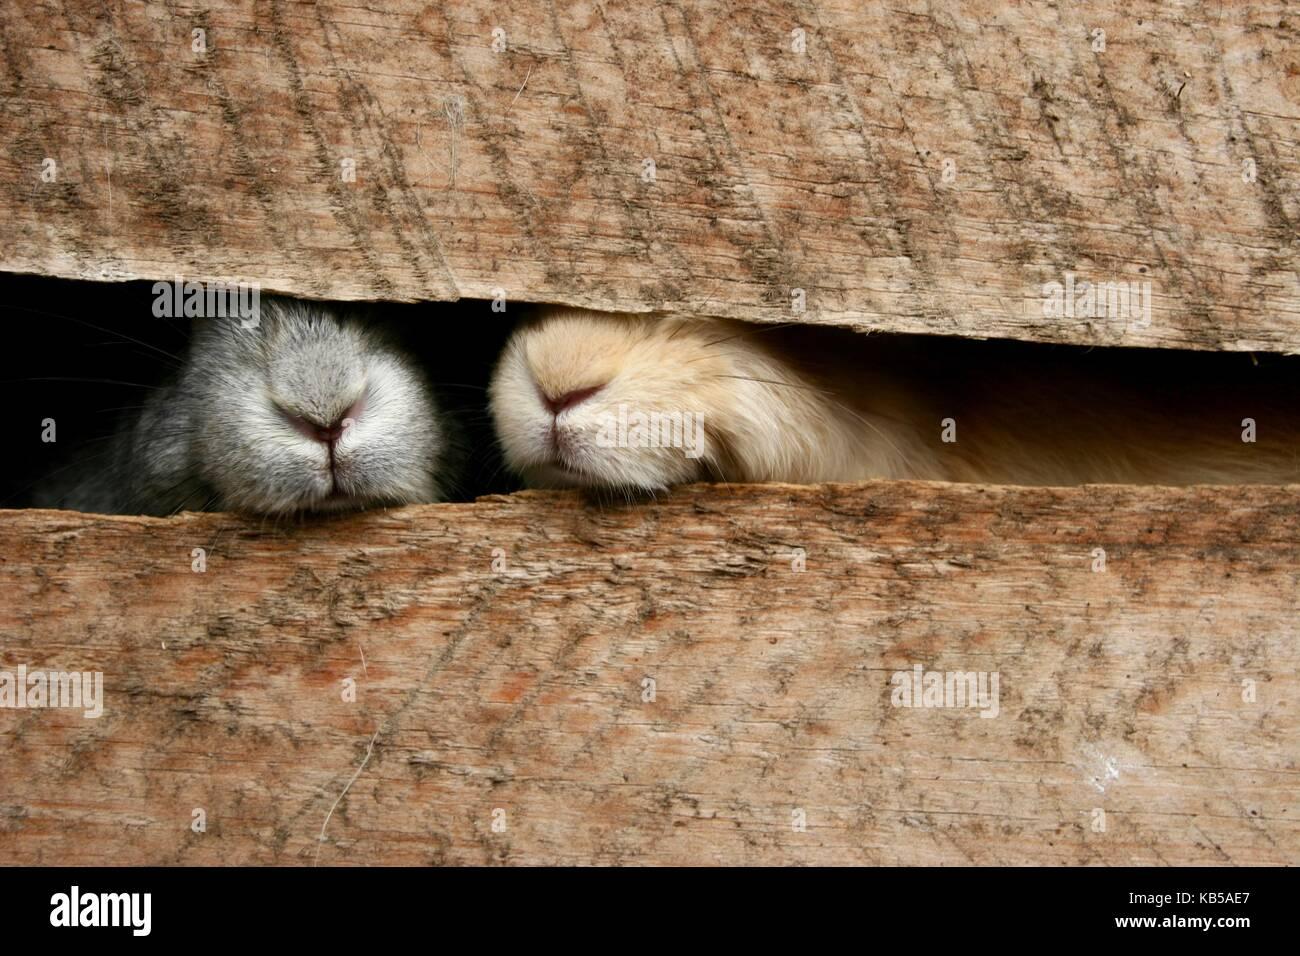 Two bunnies peep their noses through their cage - Stock Image